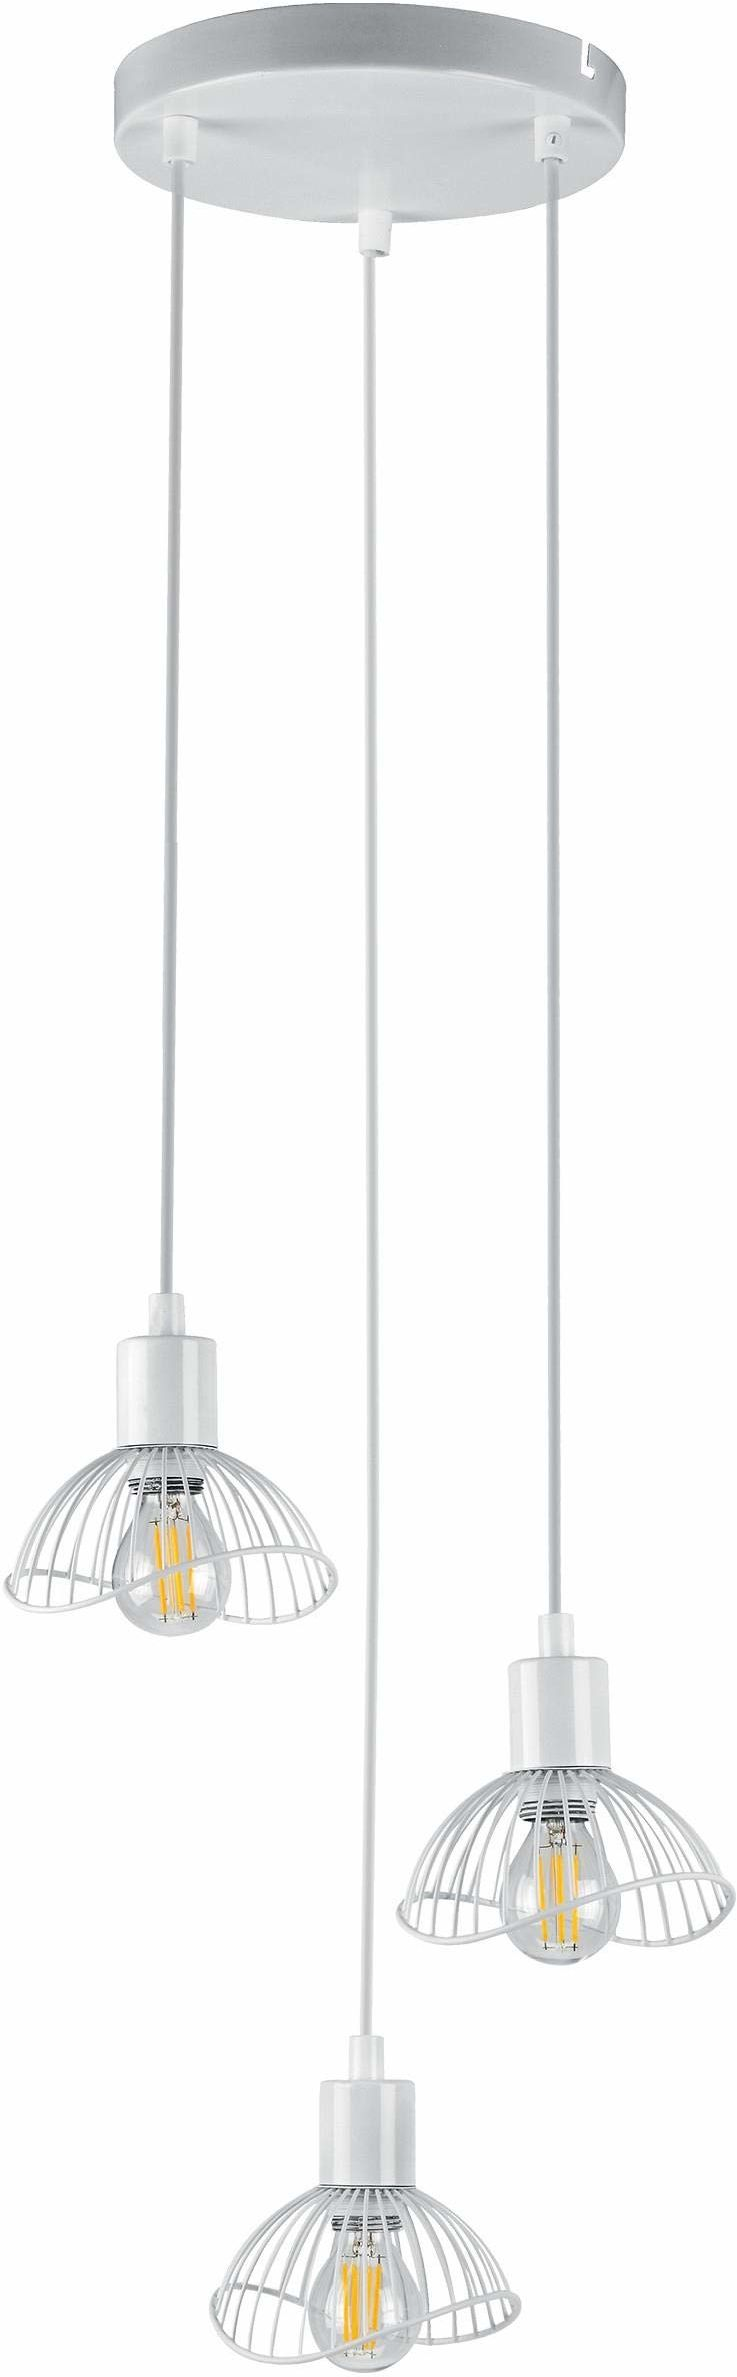 Activejet Aje-Holly 7 Whi Lampa ,Biały ,3 Żarówki